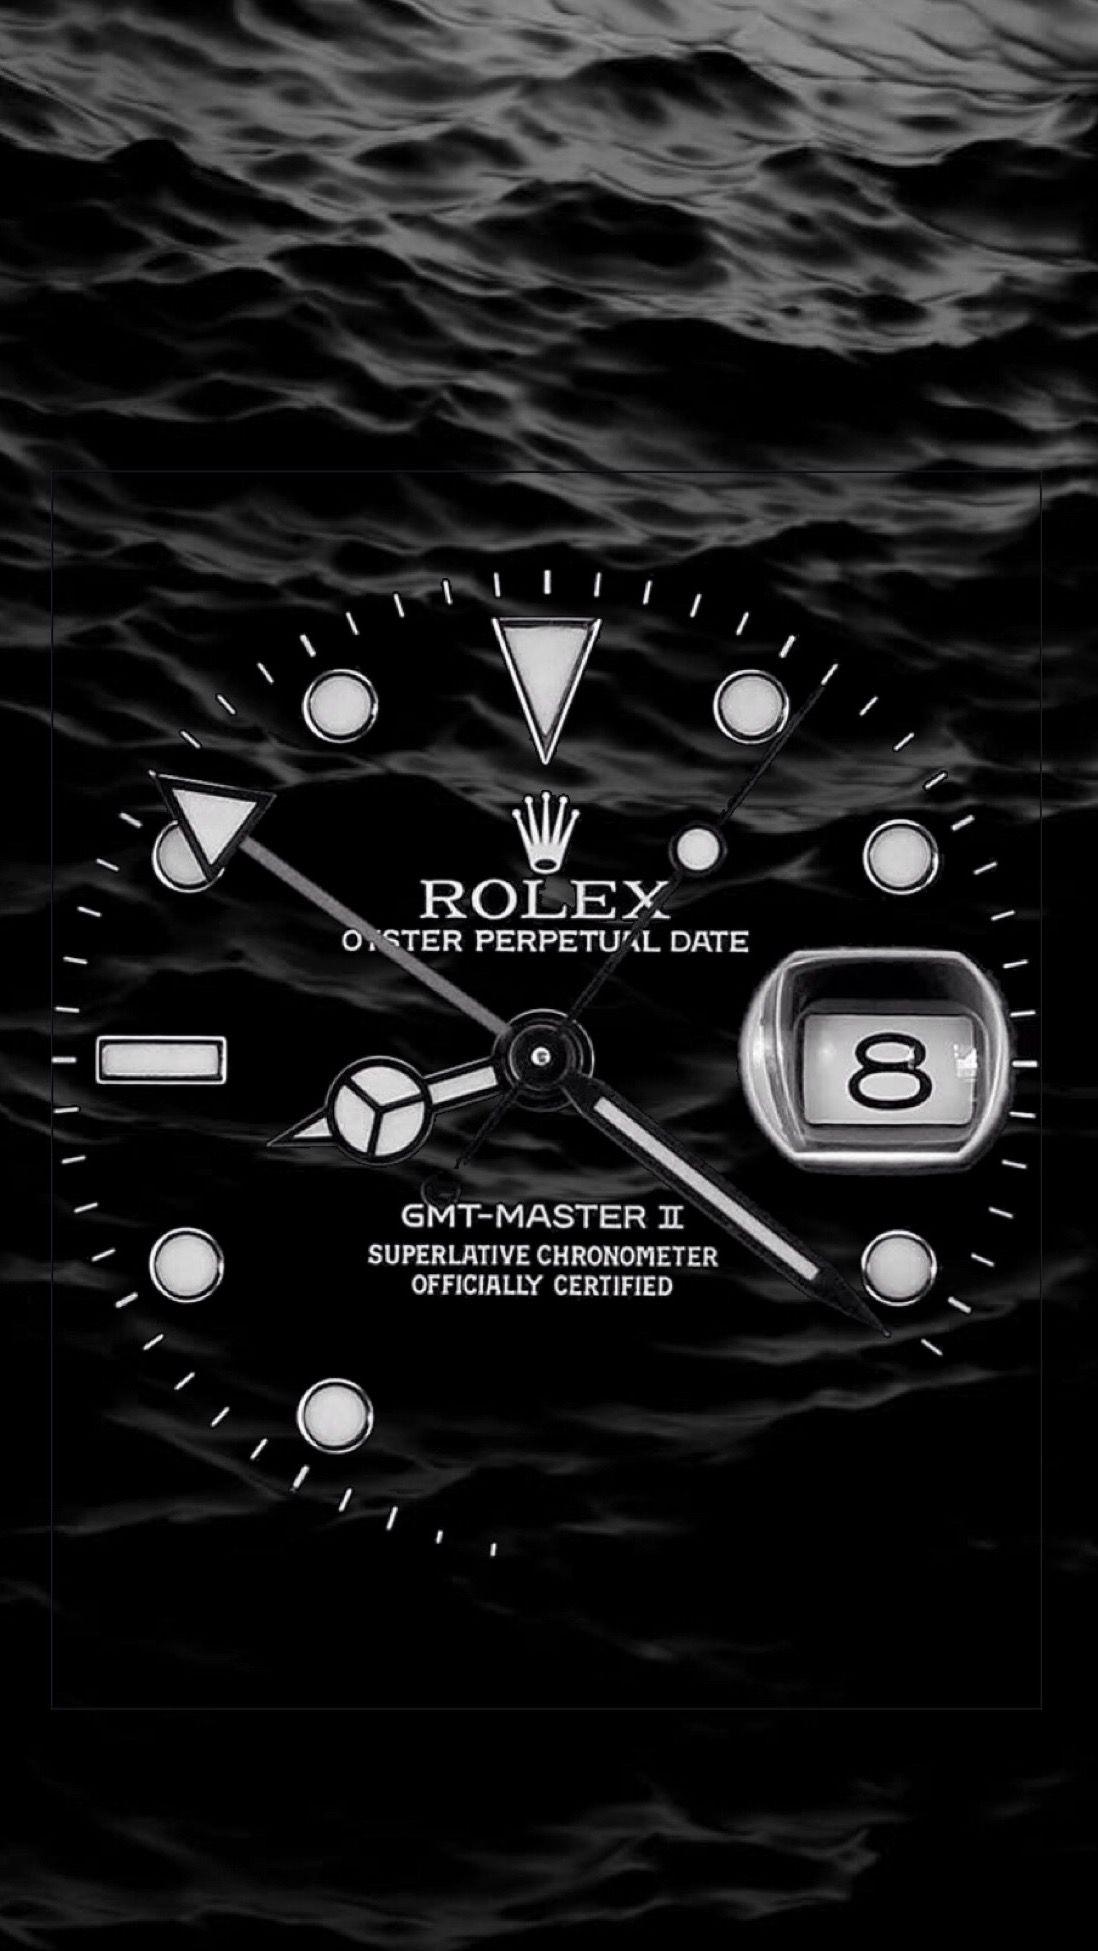 Rolex wallpaper アップルの壁紙, ロレックス, エルメス apple watch